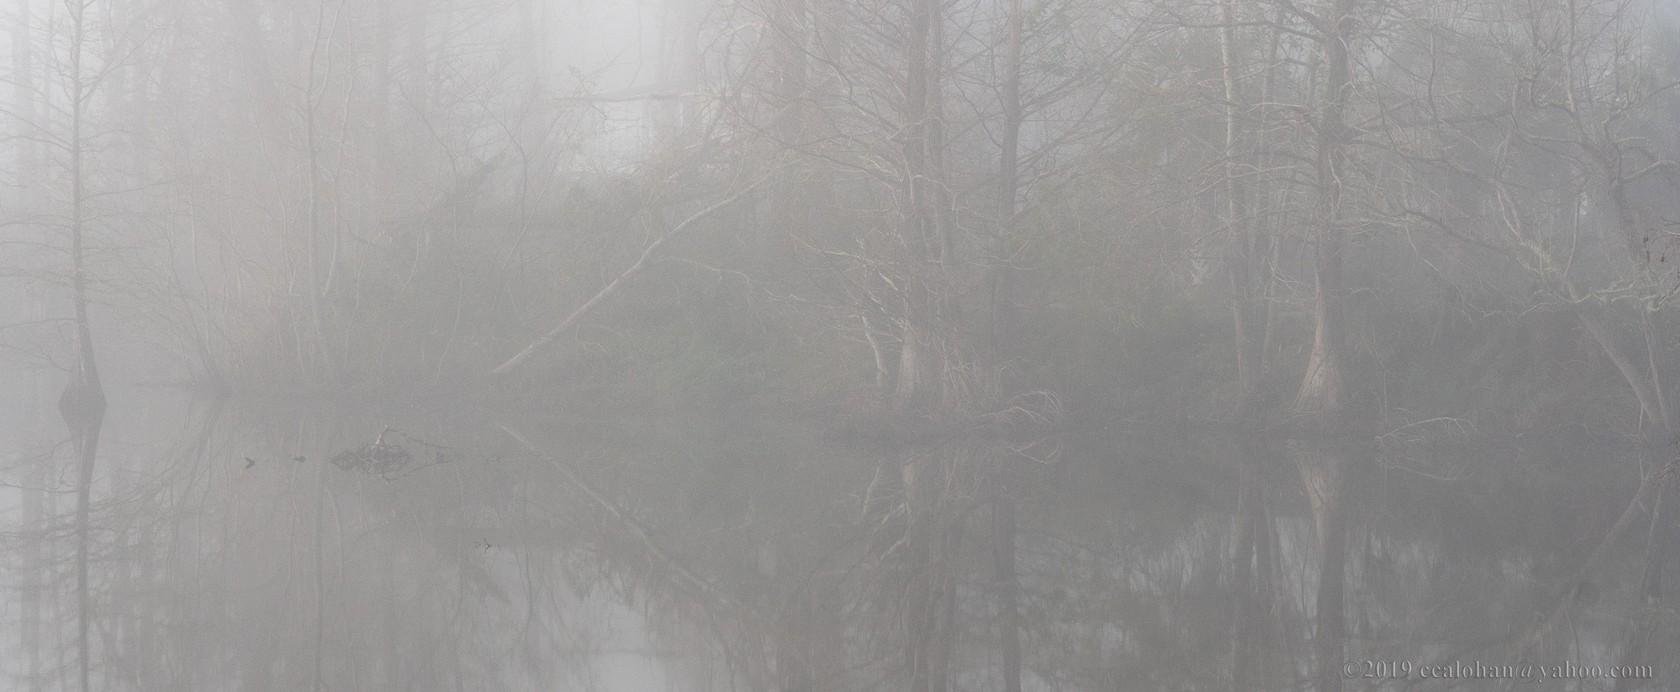 fogbound-sunrise-pano.jpg